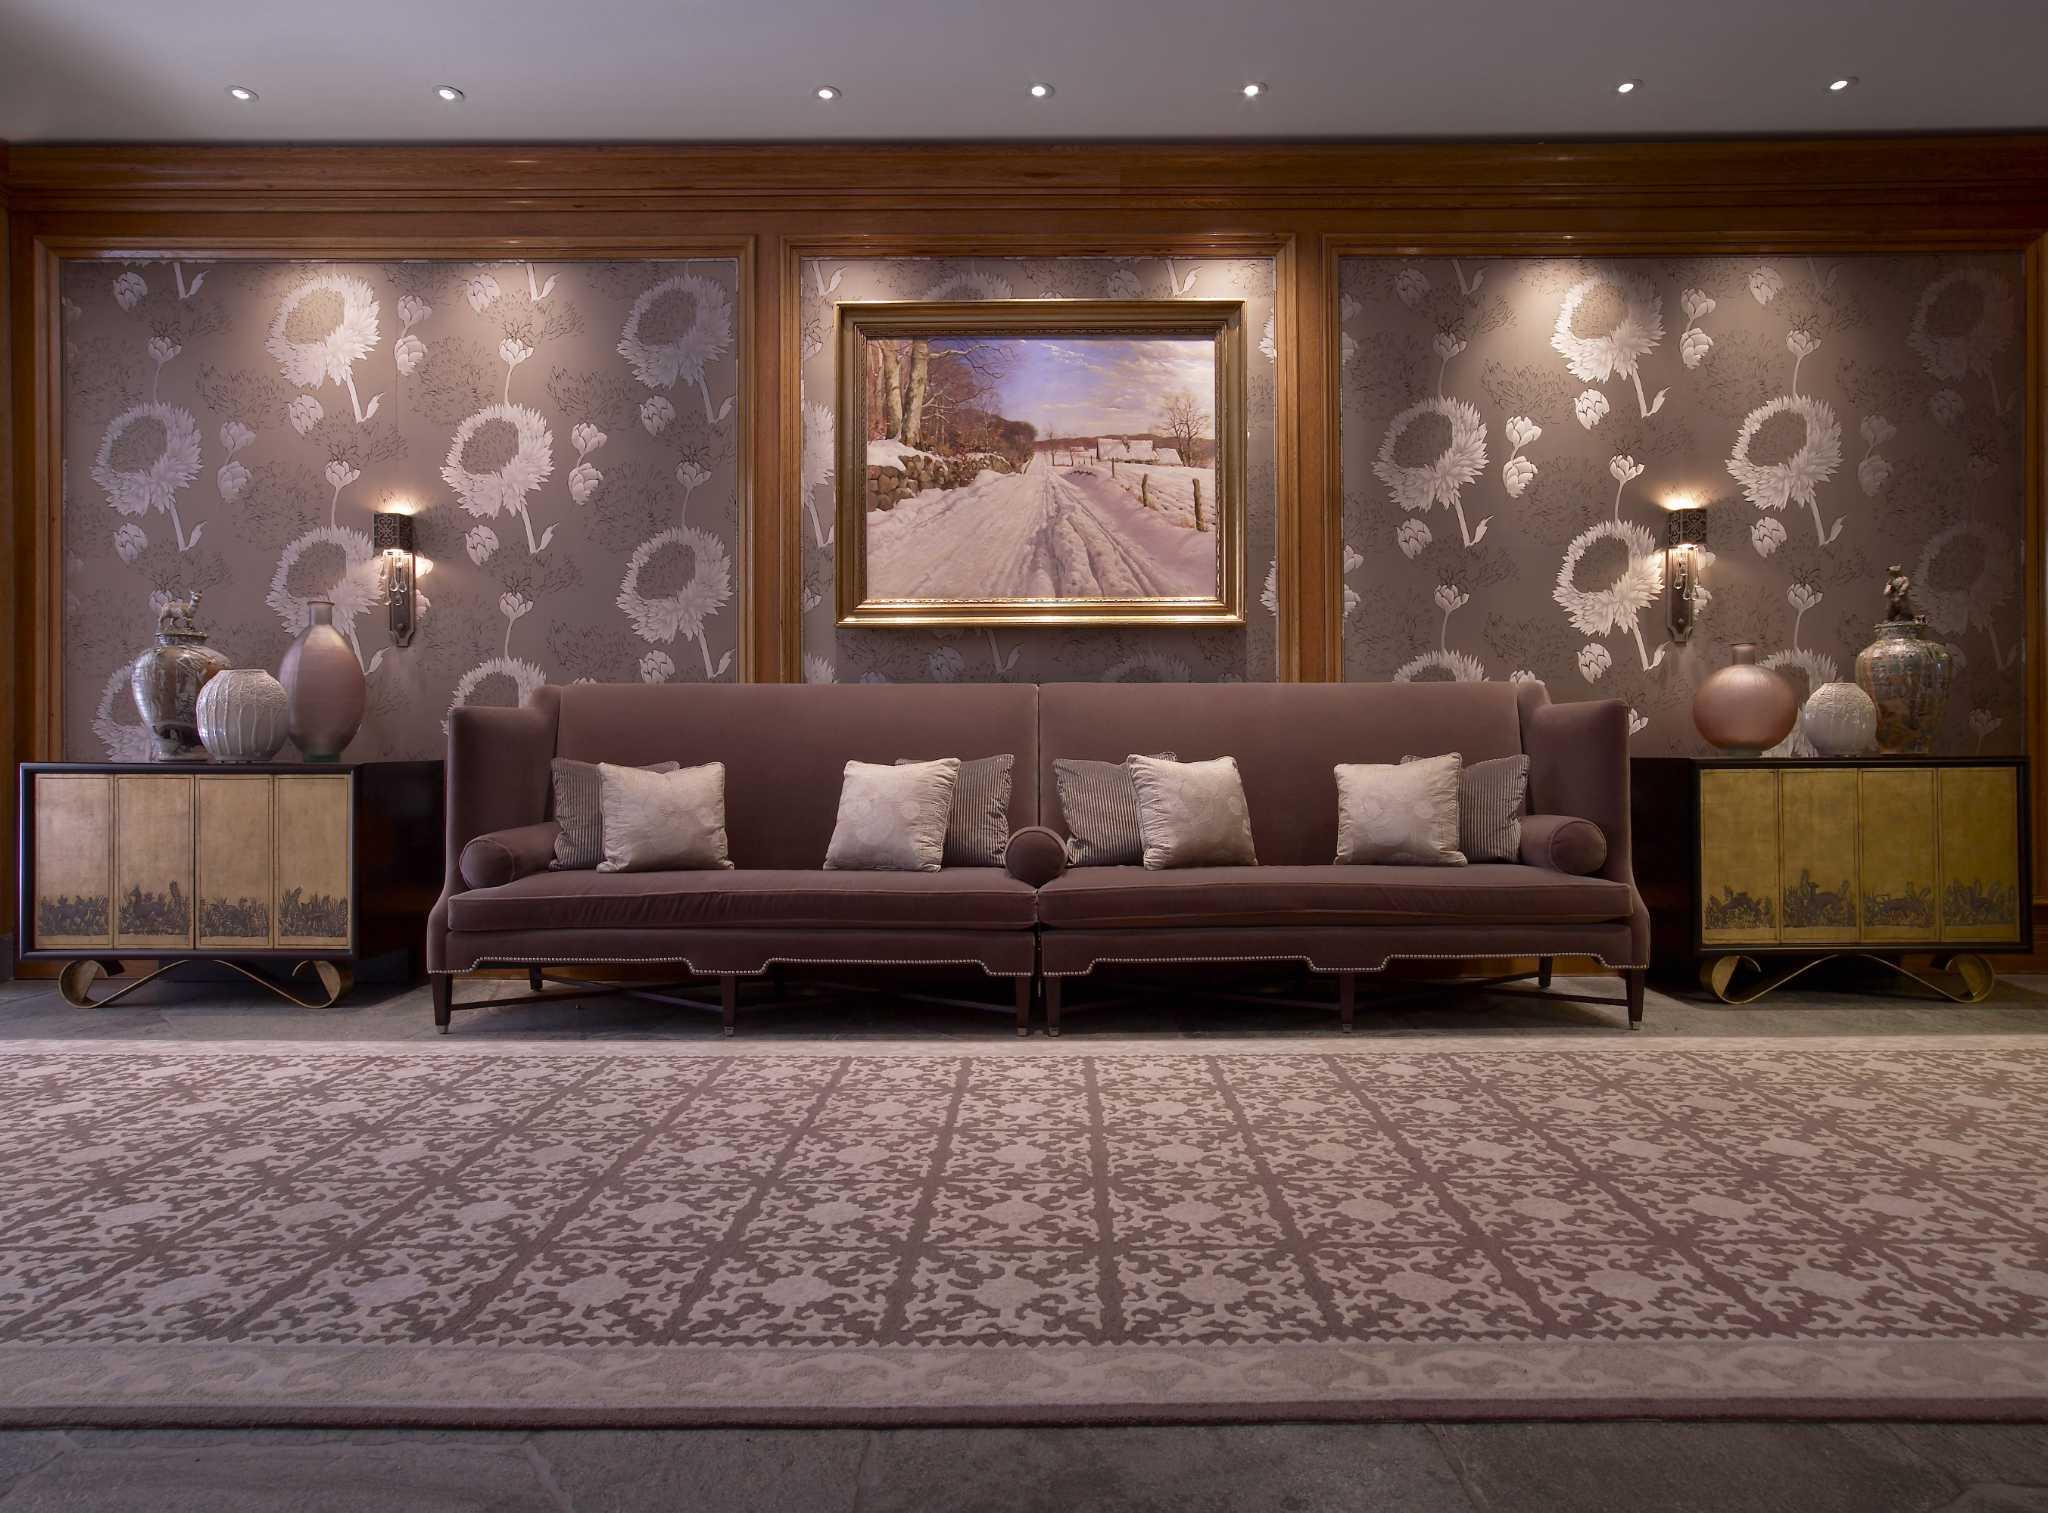 Art and architecture inform lauren rottets interior design houstonchronicle com